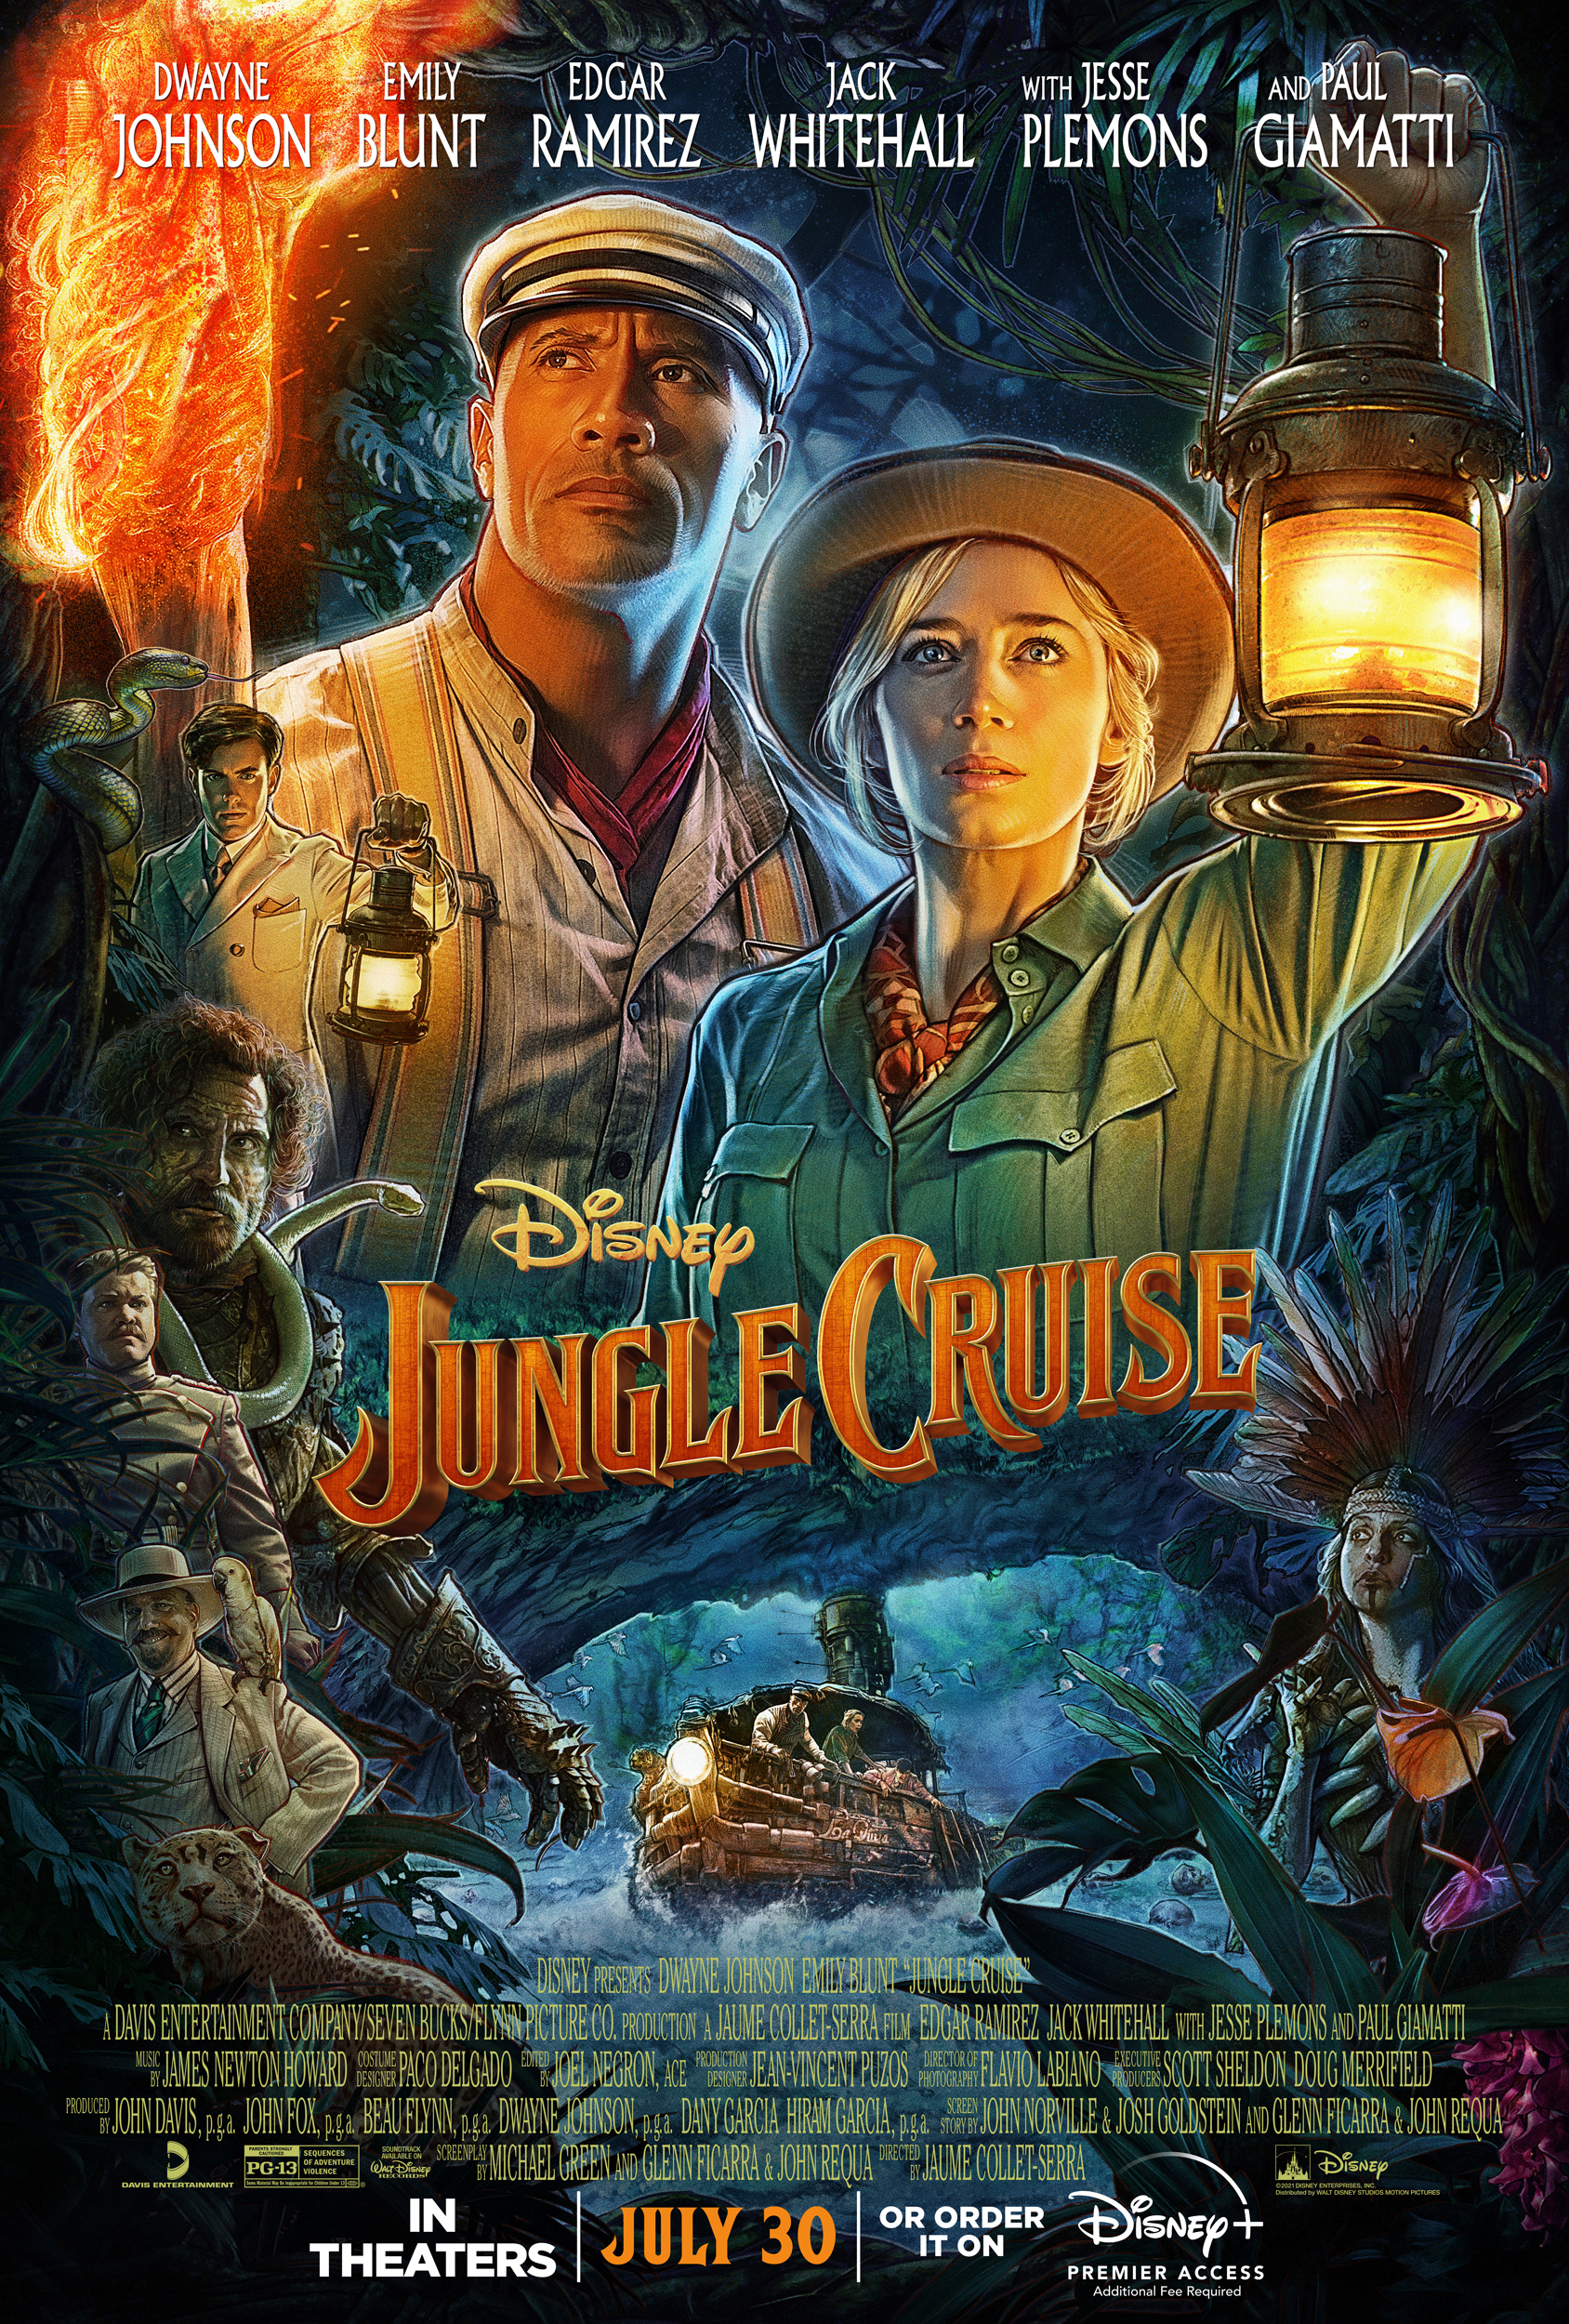 New Movie: Jungle Cruise Starring Dwayne Johnson & Emily Blunt